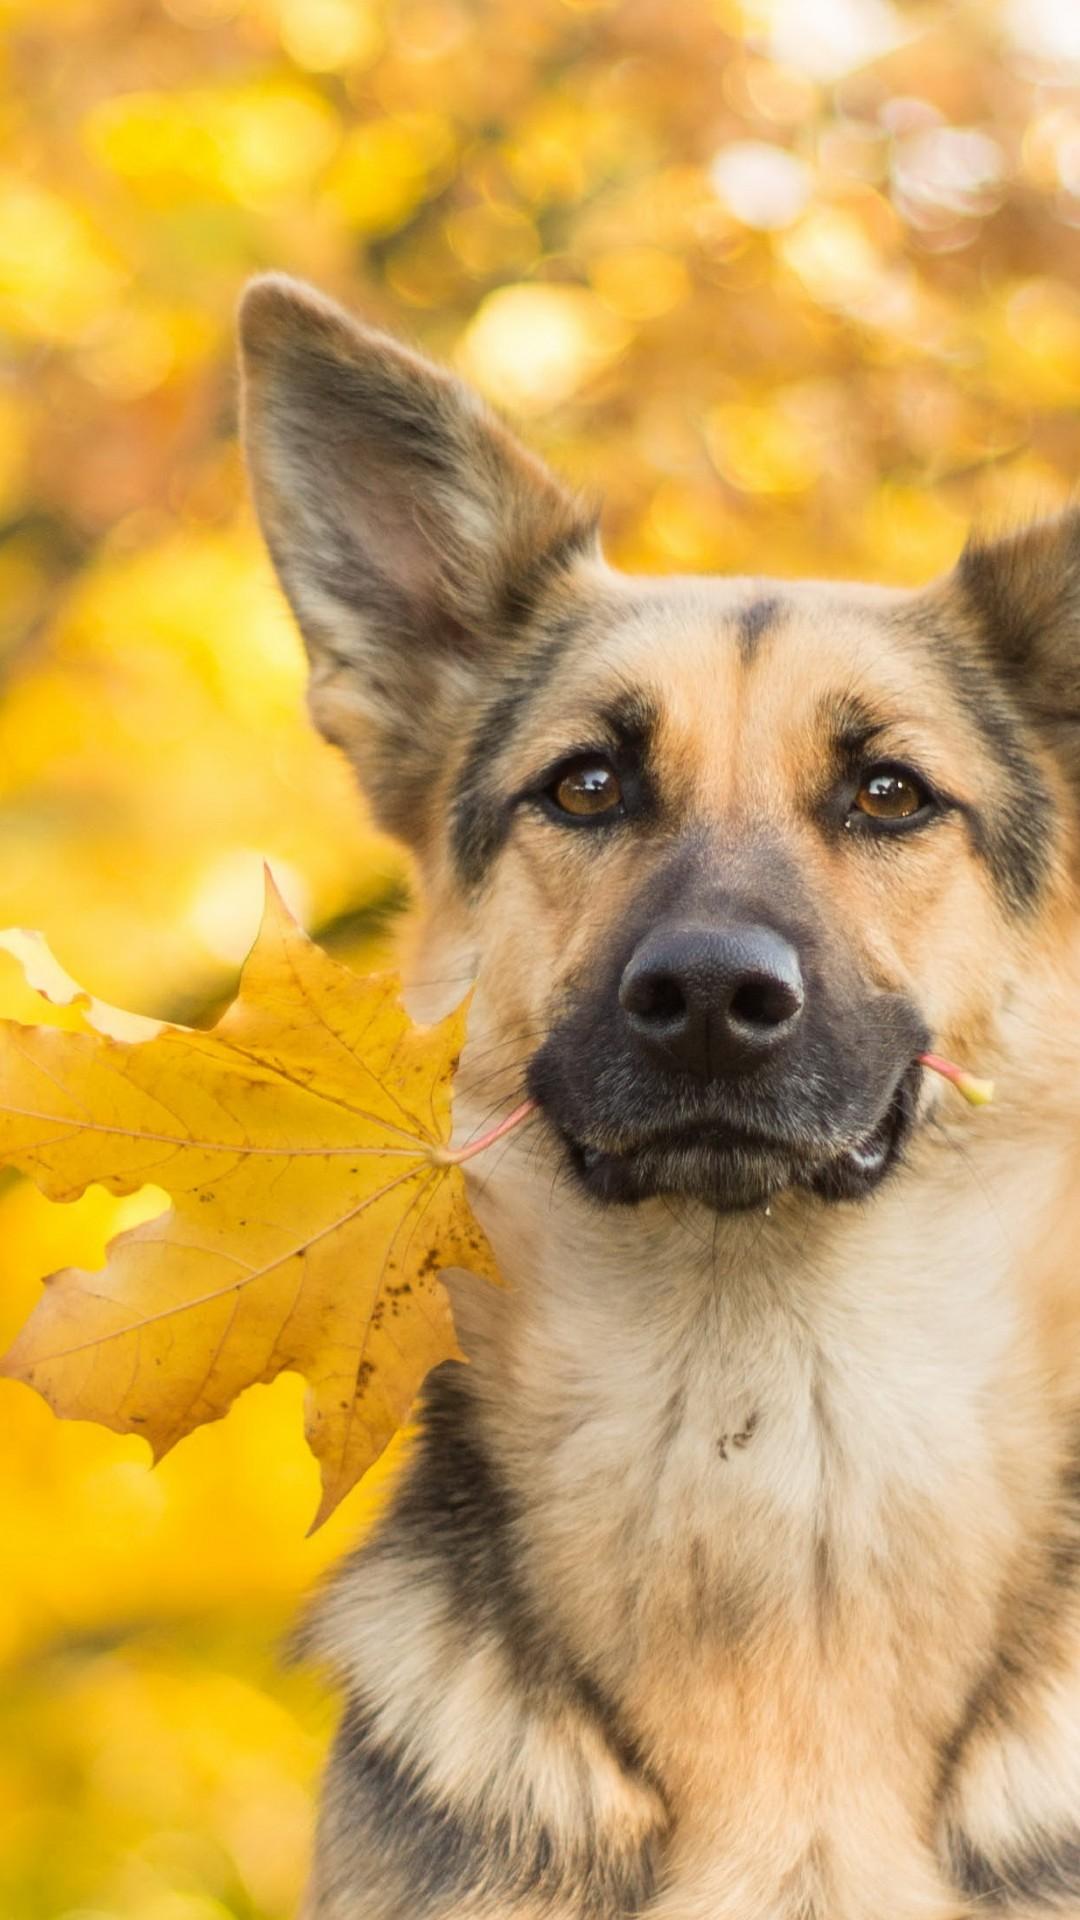 Wallpaper Dog Cute Animals Leaves Autumn 4k Animals